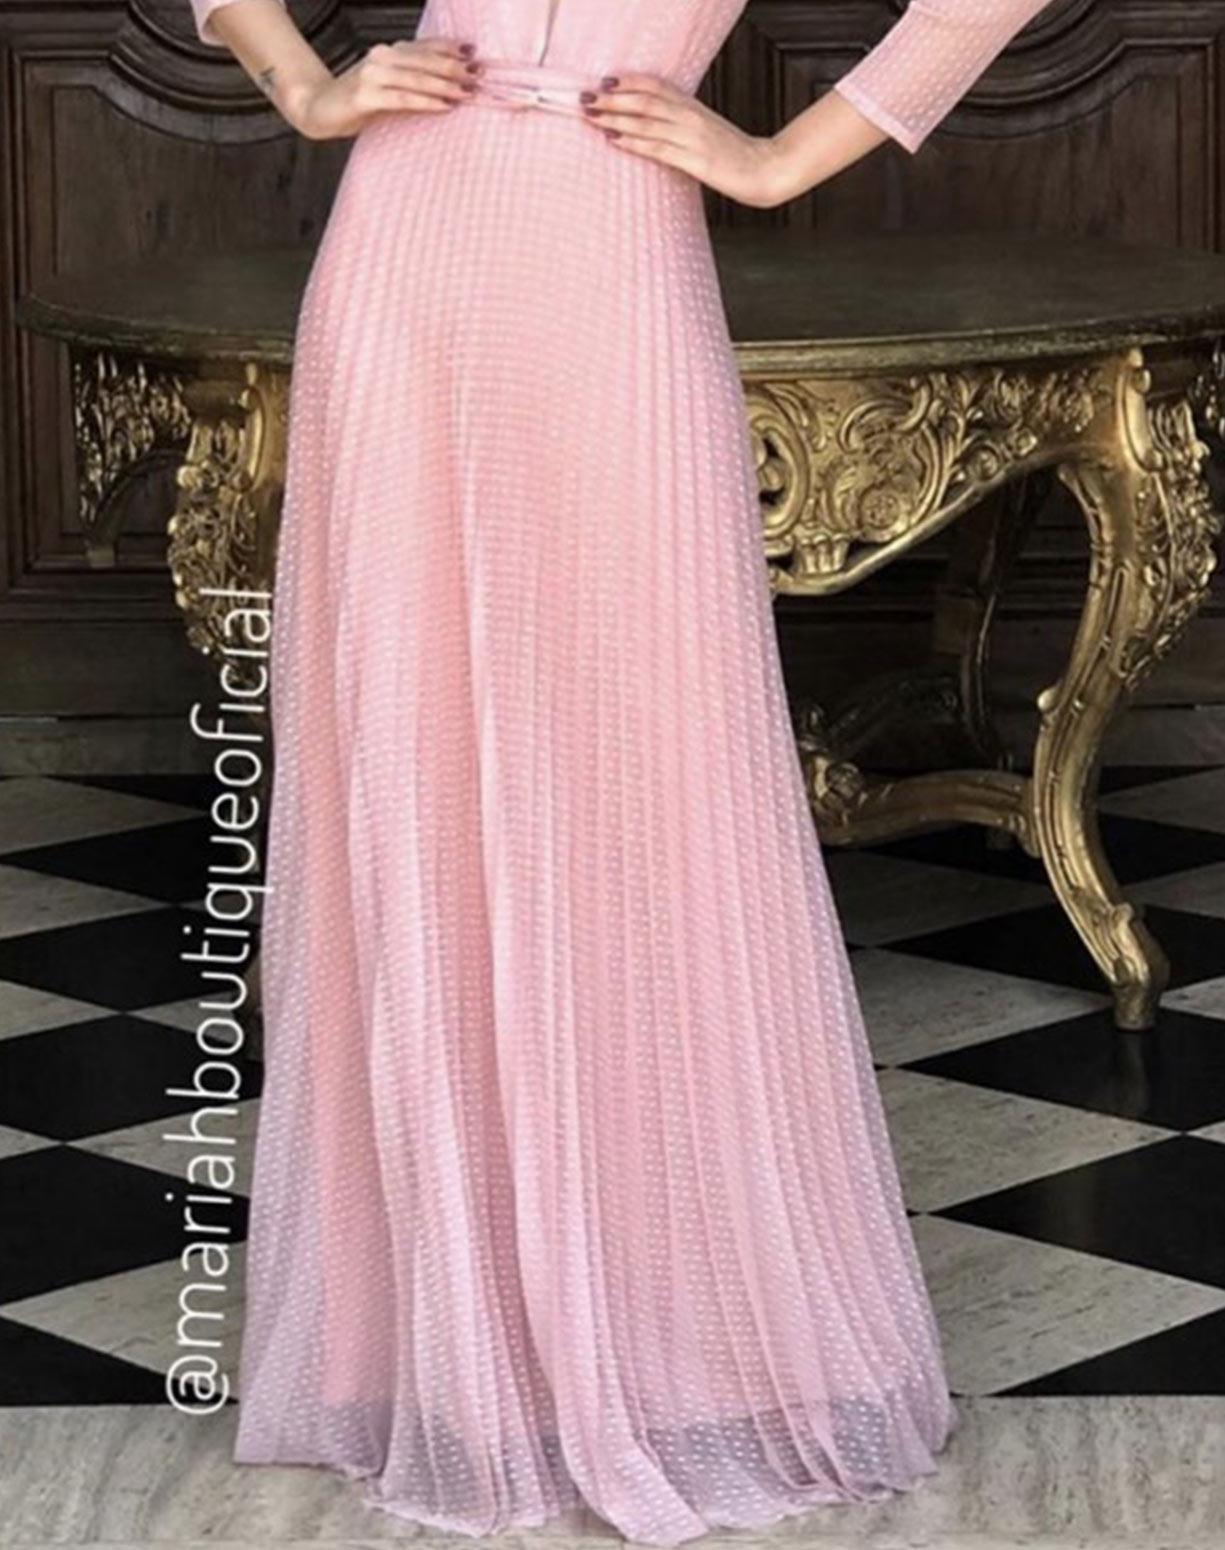 Vestido Rosê em Tule Texturizado